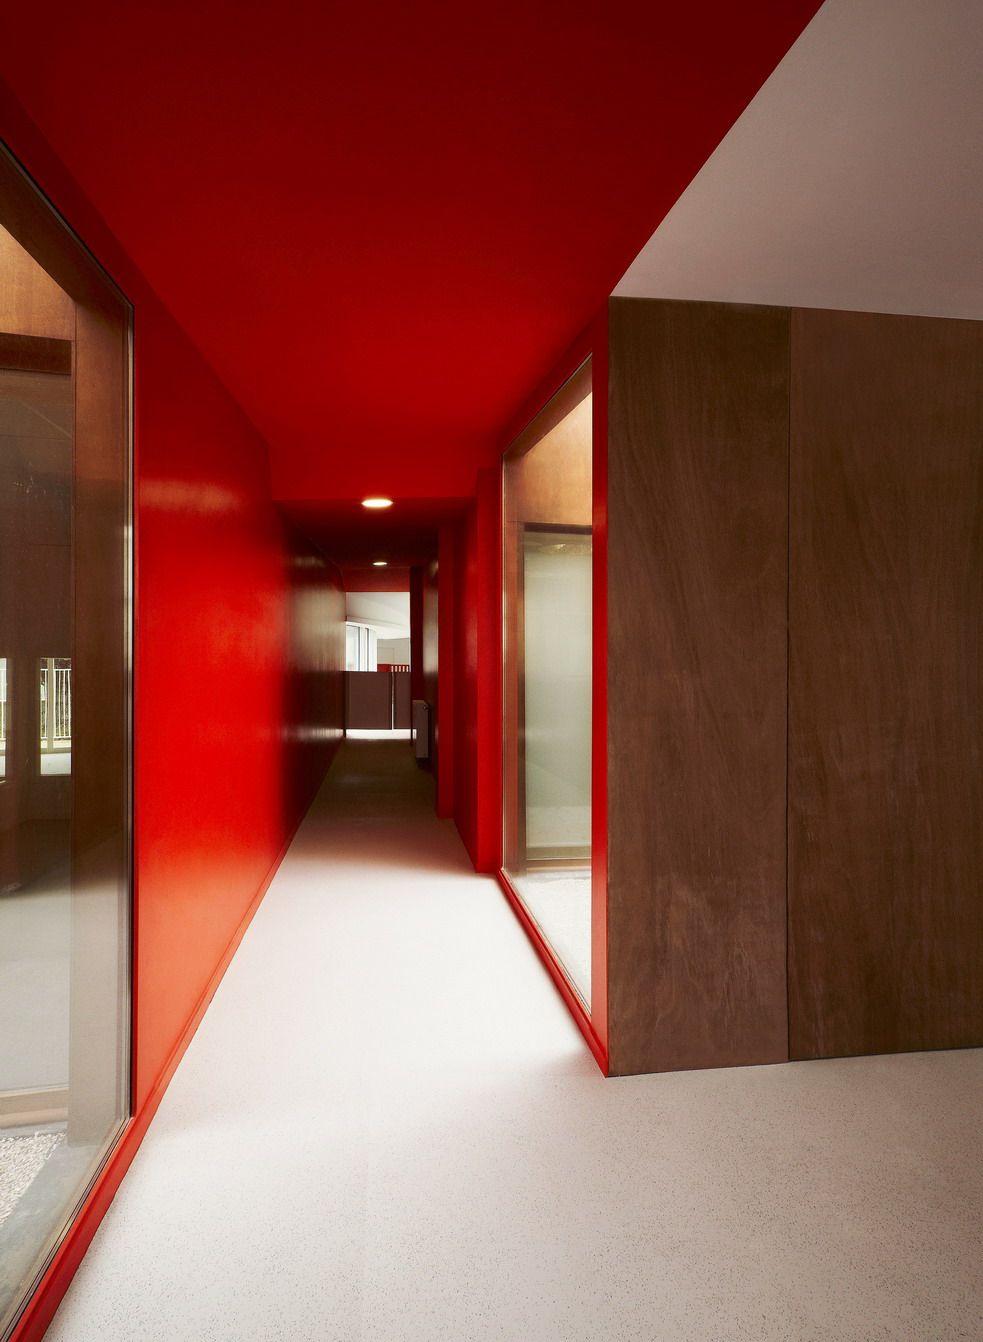 Corridor Design Color: *red Hallway, Corridors, Modern Interior Design, Colors